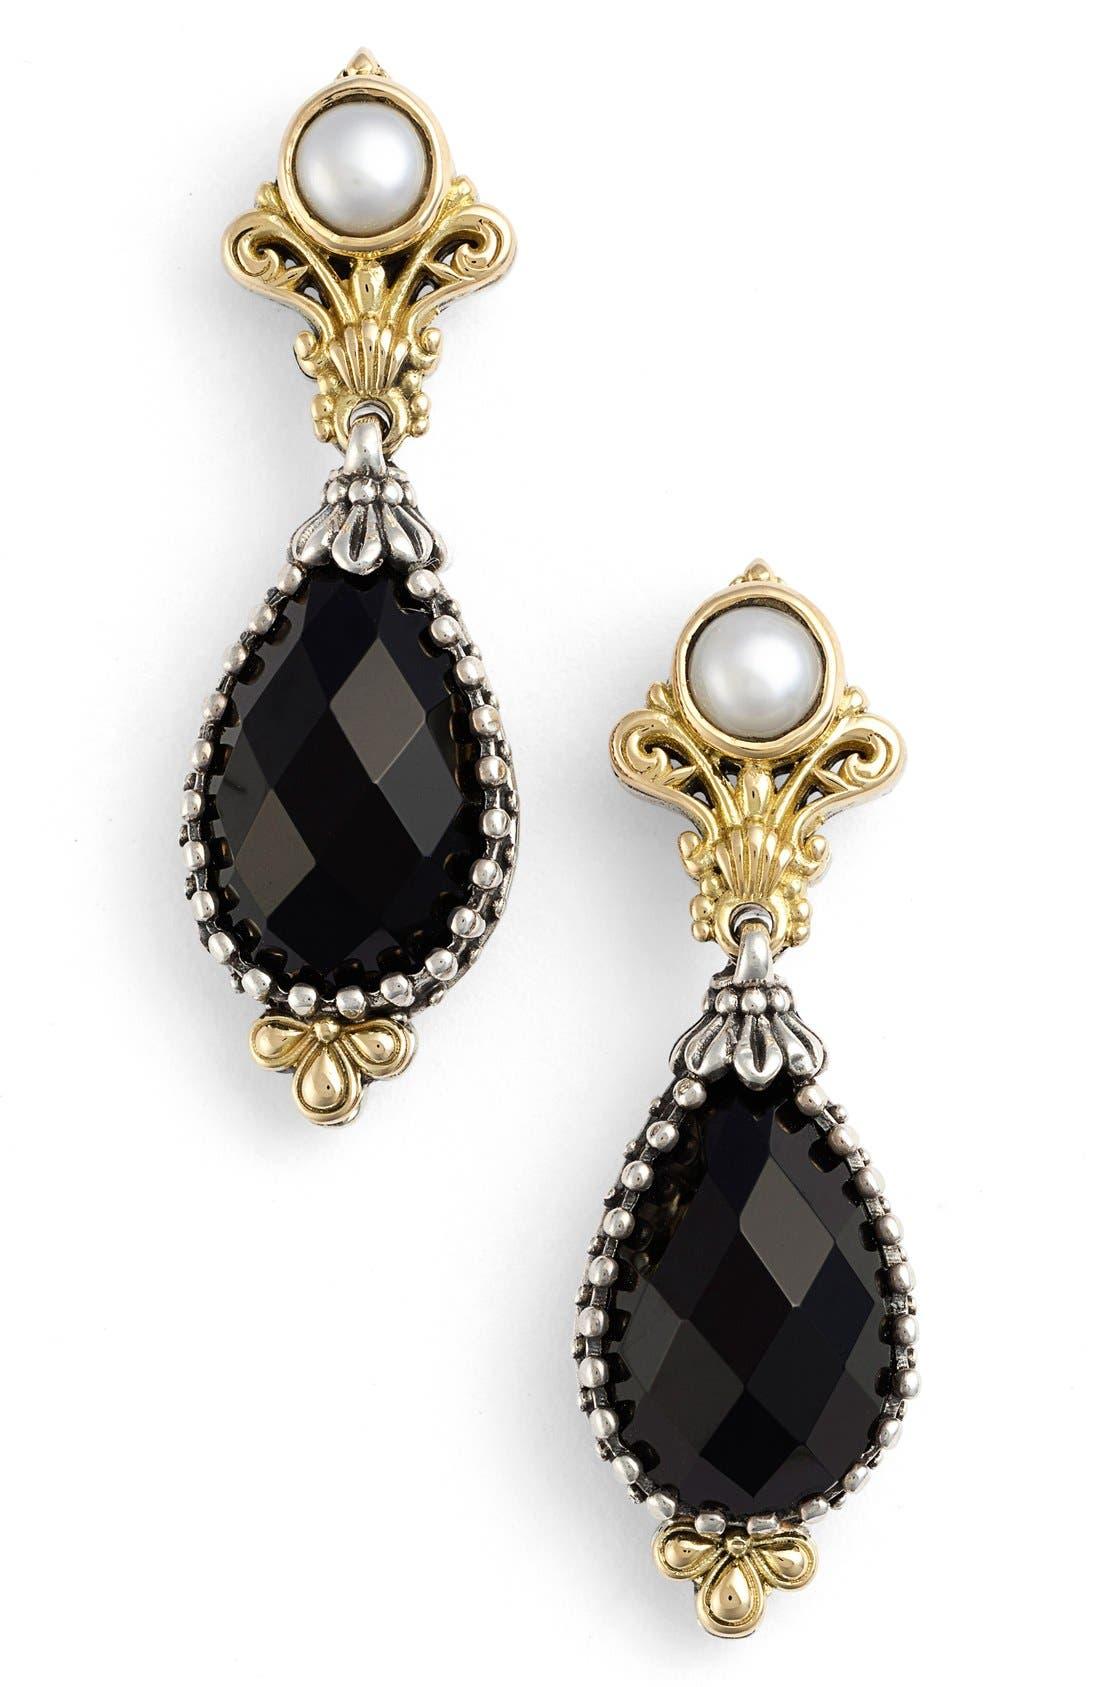 'Nykta' Pearl & Black Onyx Drop Earrings,                             Main thumbnail 1, color,                             Silver/ Gold/ Pearl